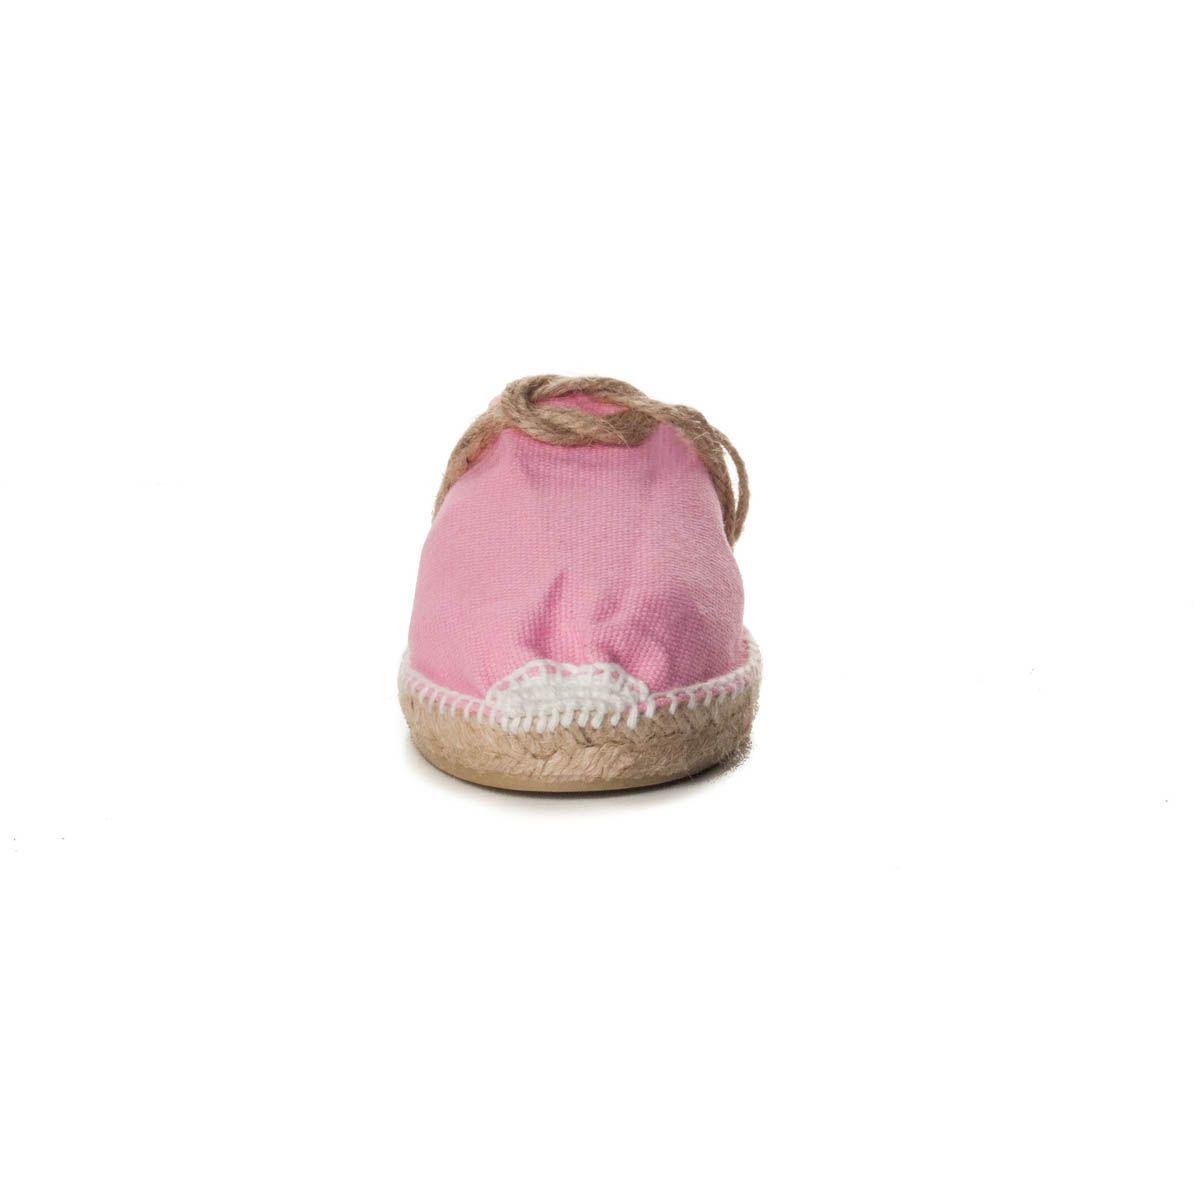 Maria Graor Artisanal Espadrille in Pink